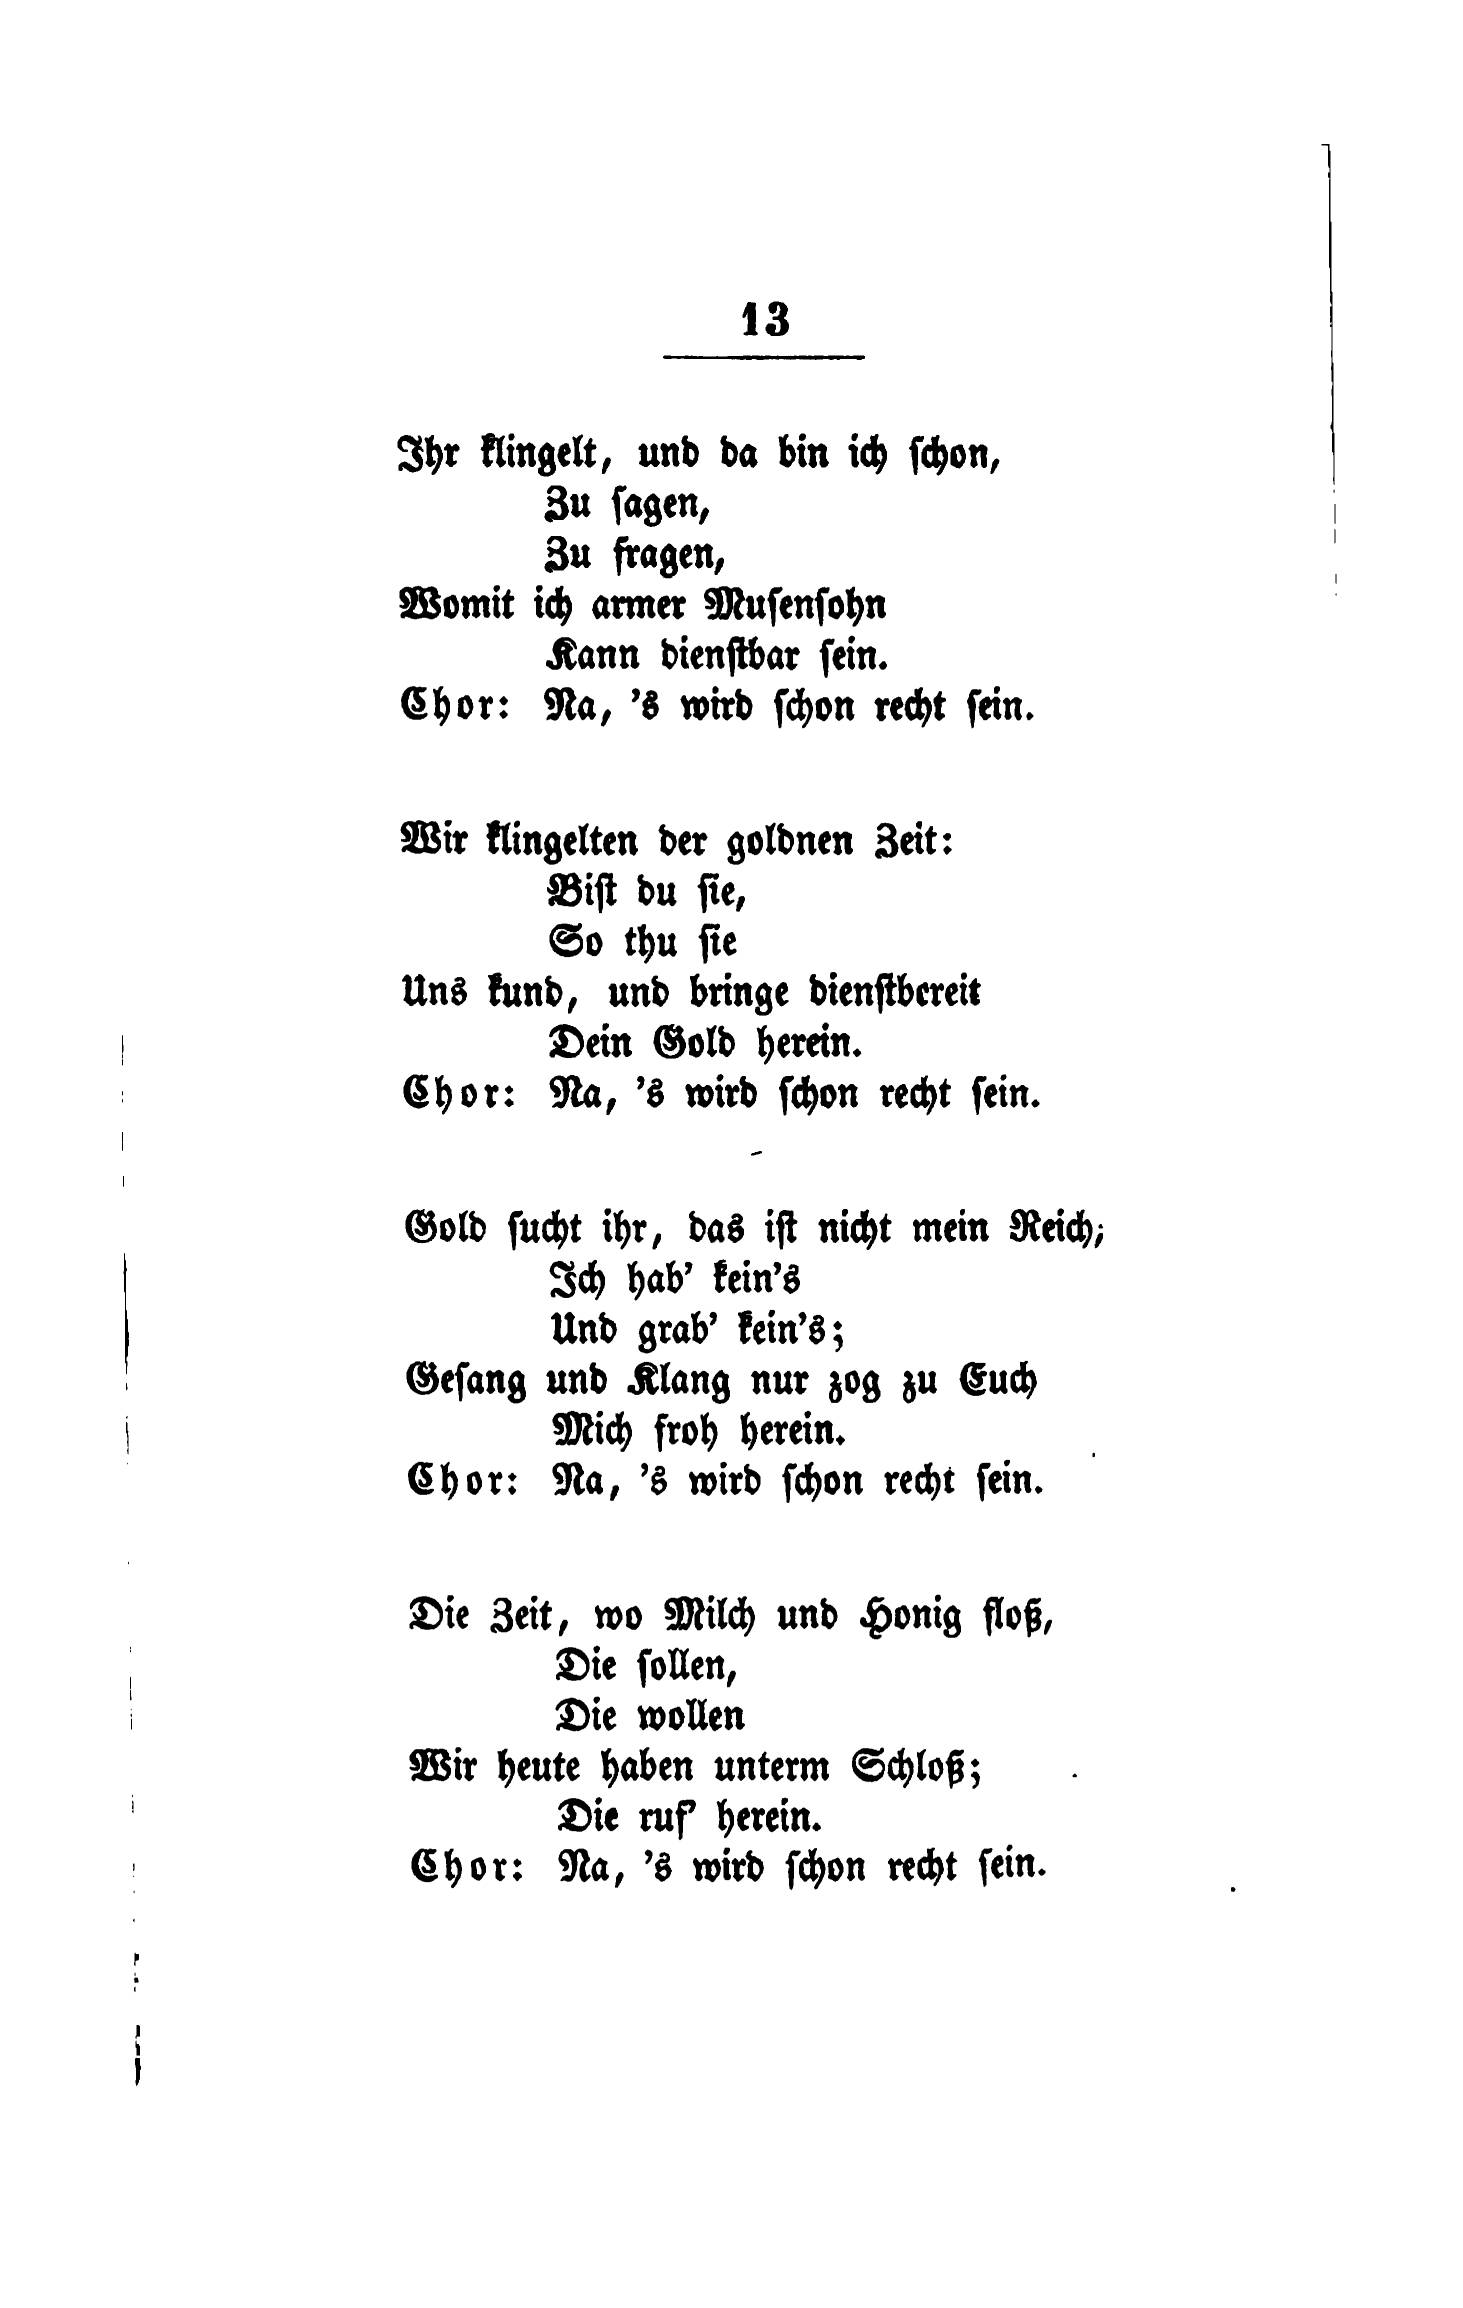 File:Gedichte (Geisheim) 013 jpg - Wikimedia Commons